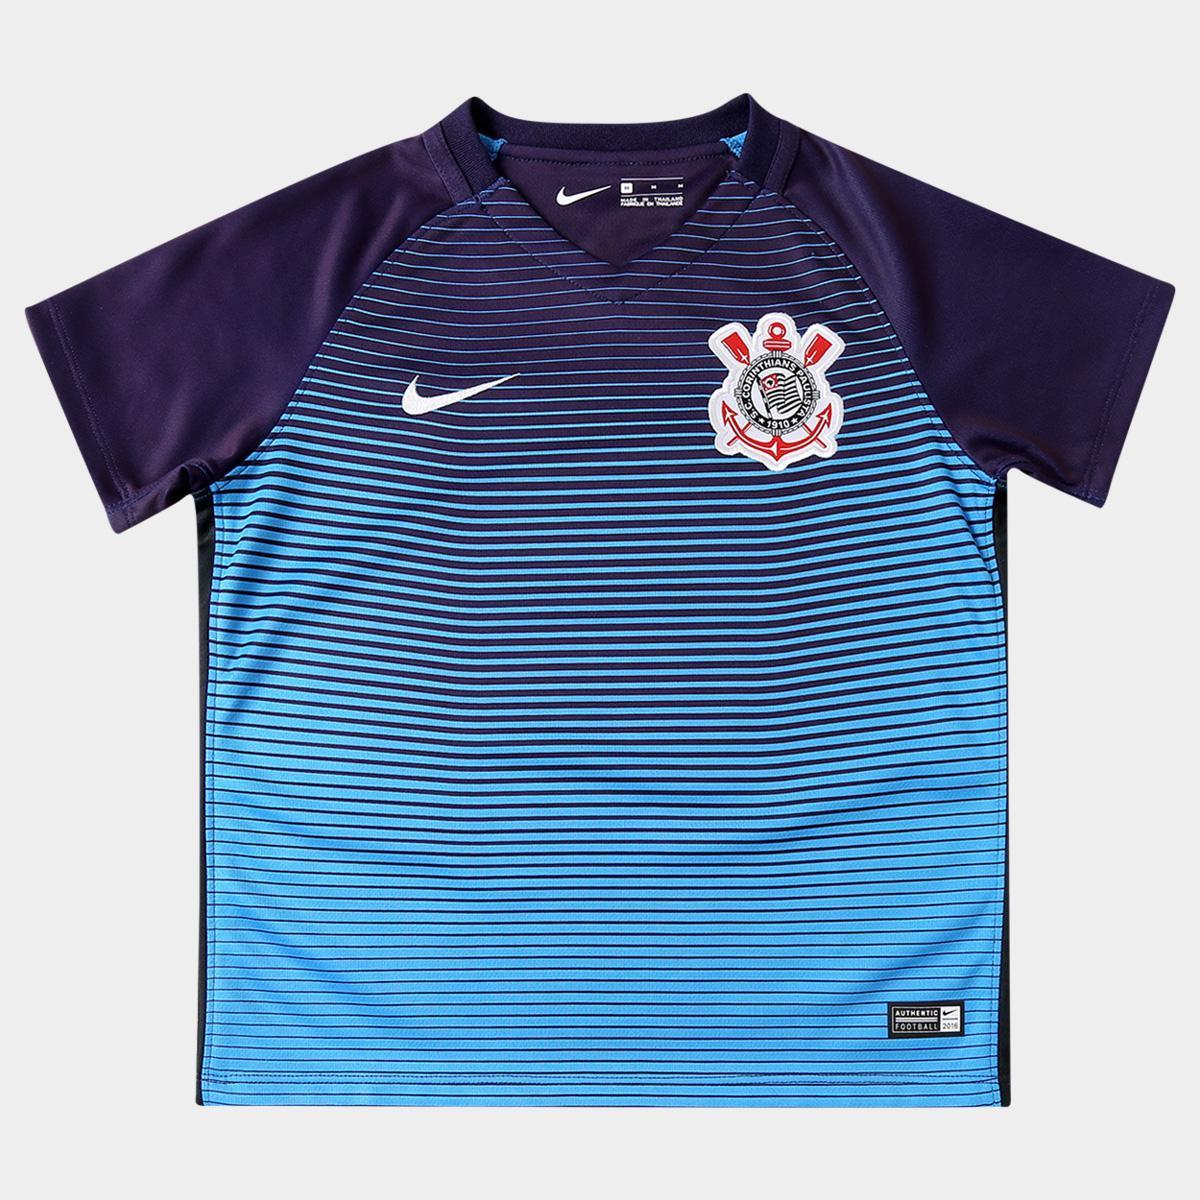 526e1298c9 Camisa Corinthians Infantil III 2016 s nº Torcedor Nike - Compre Agora